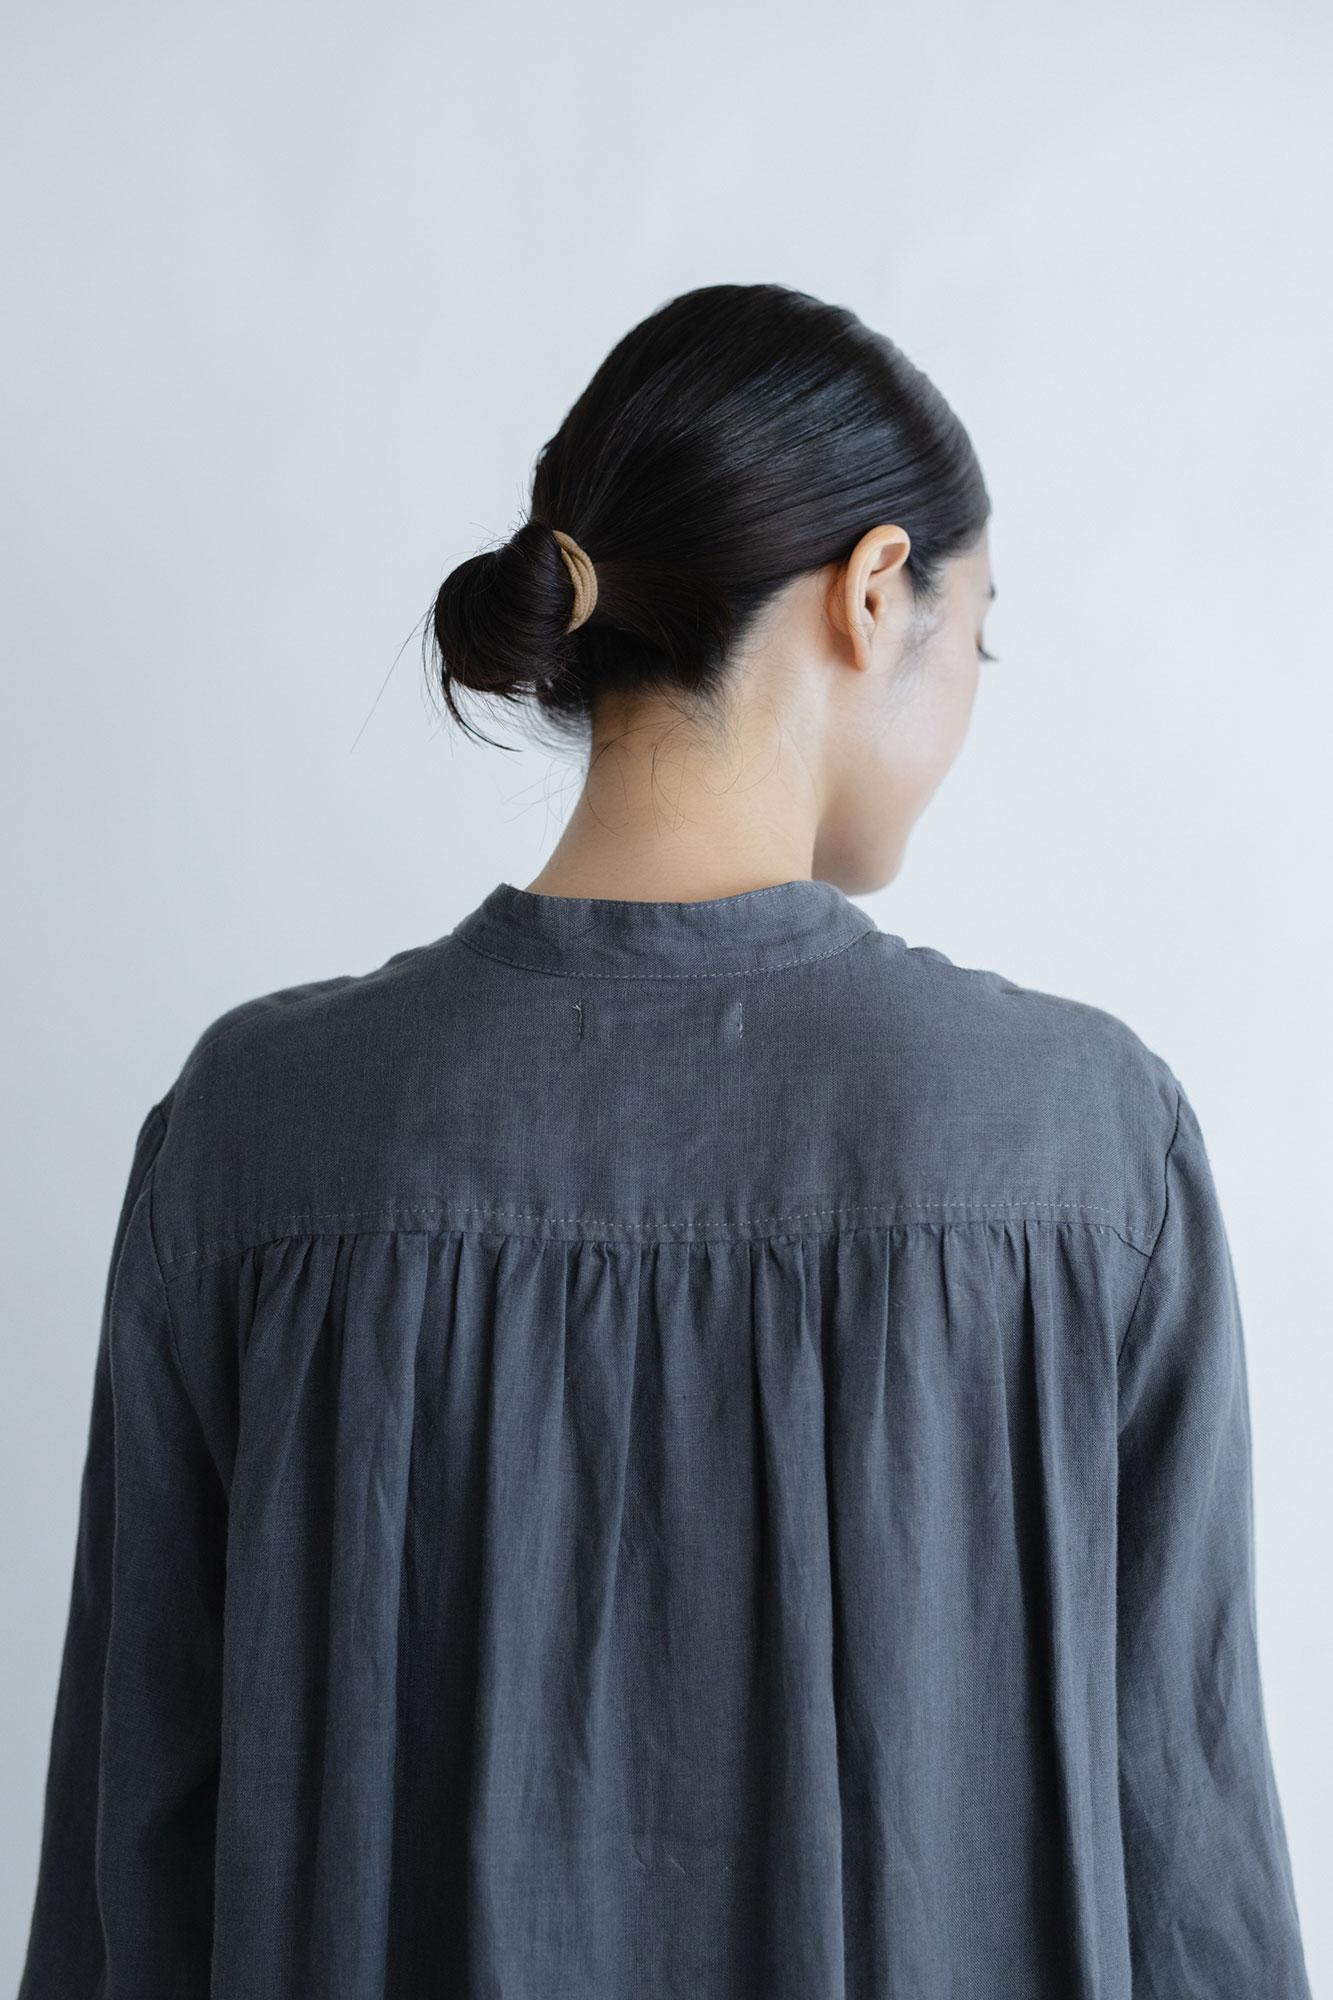 fog linen work キャロライン ワンピース アルドワーズ